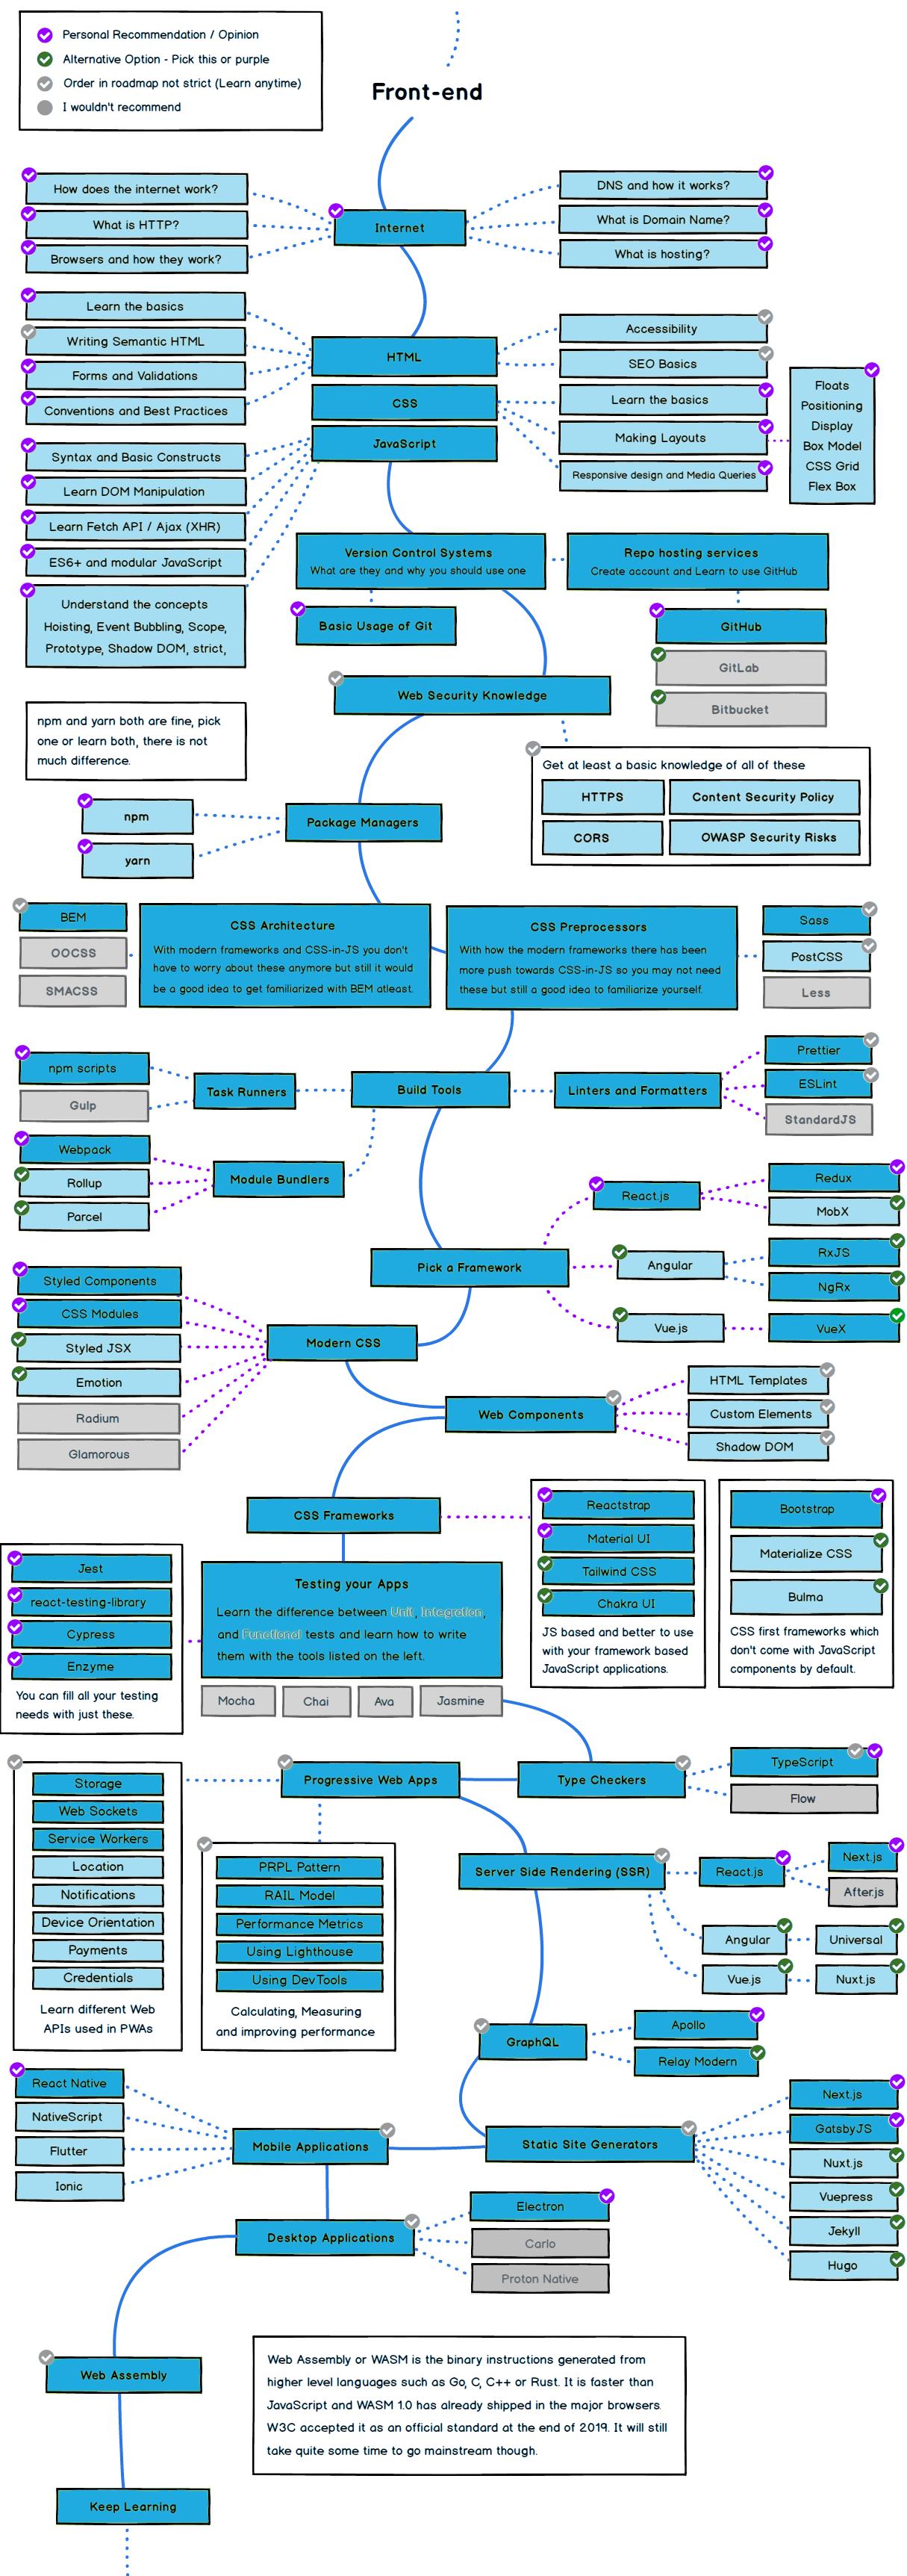 Front-End Web Developer RoadMap 2021